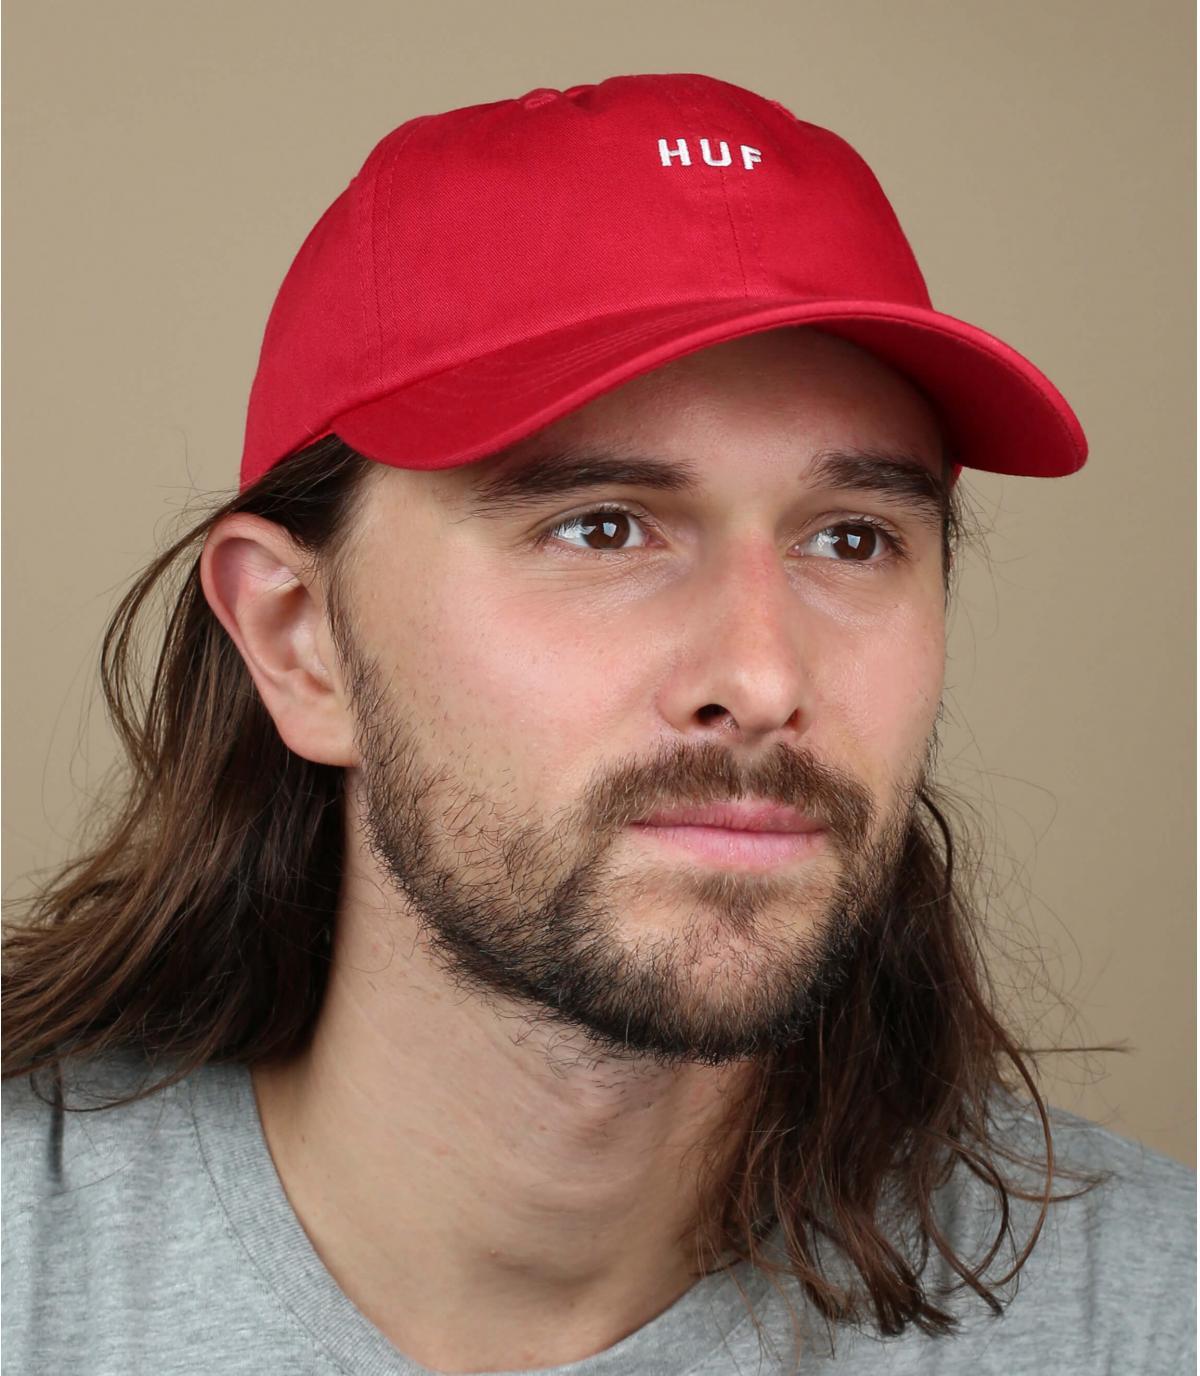 Rote Huf Cap